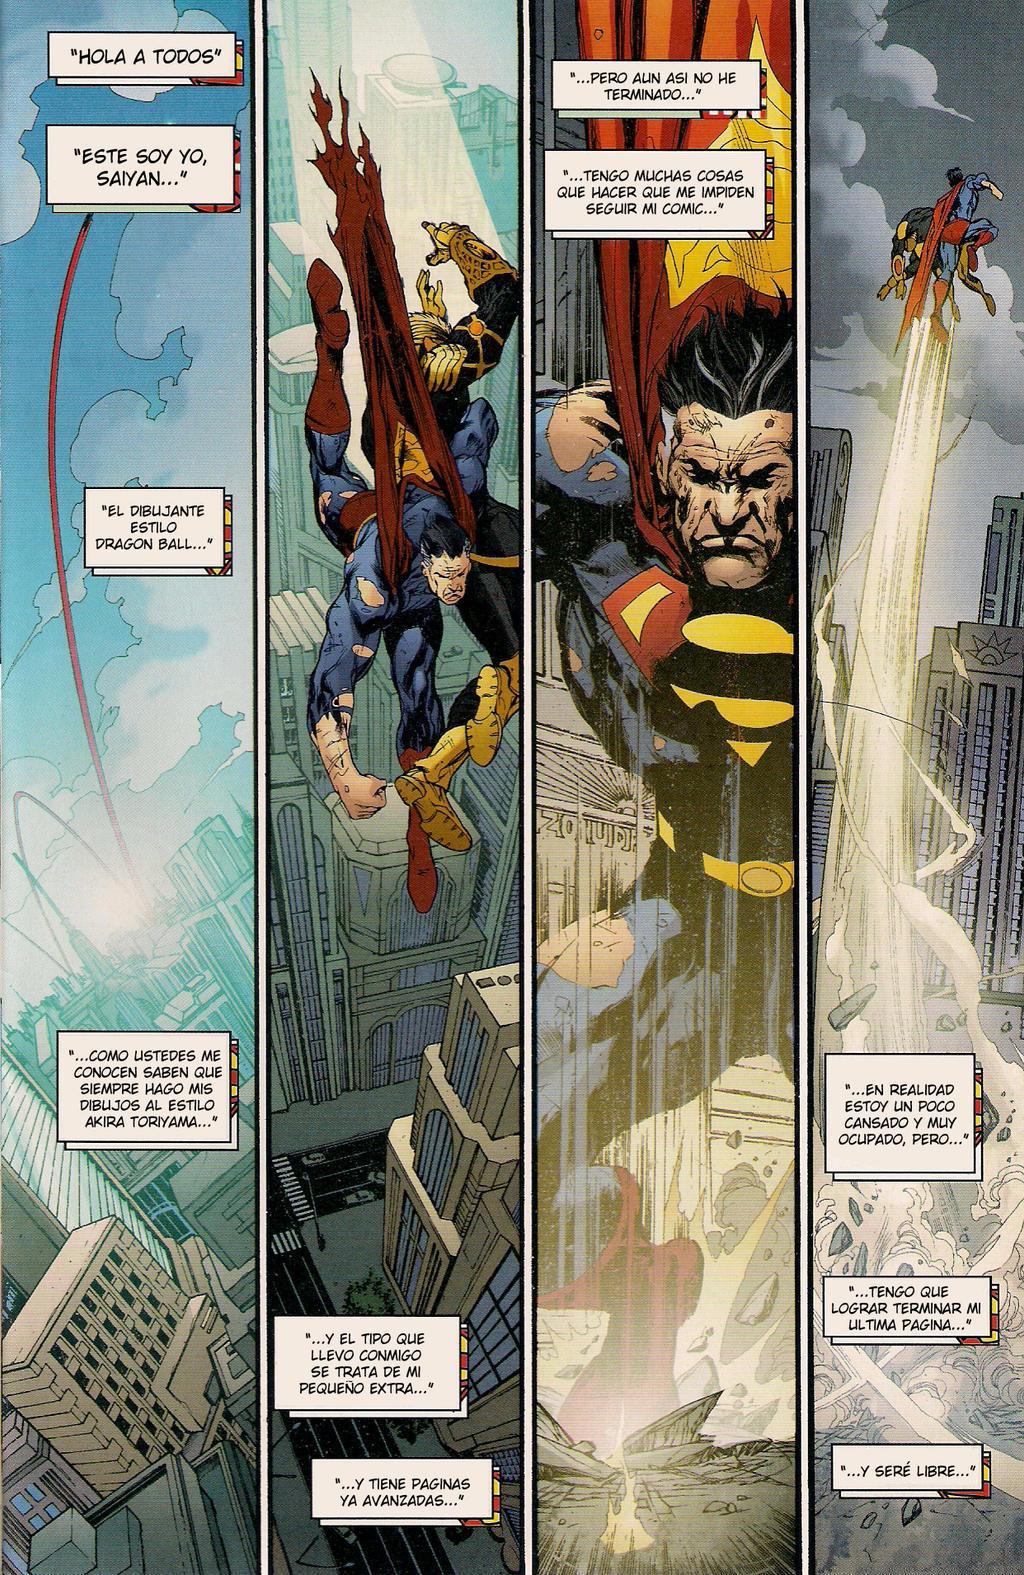 Superman 01 by Saiyan1238